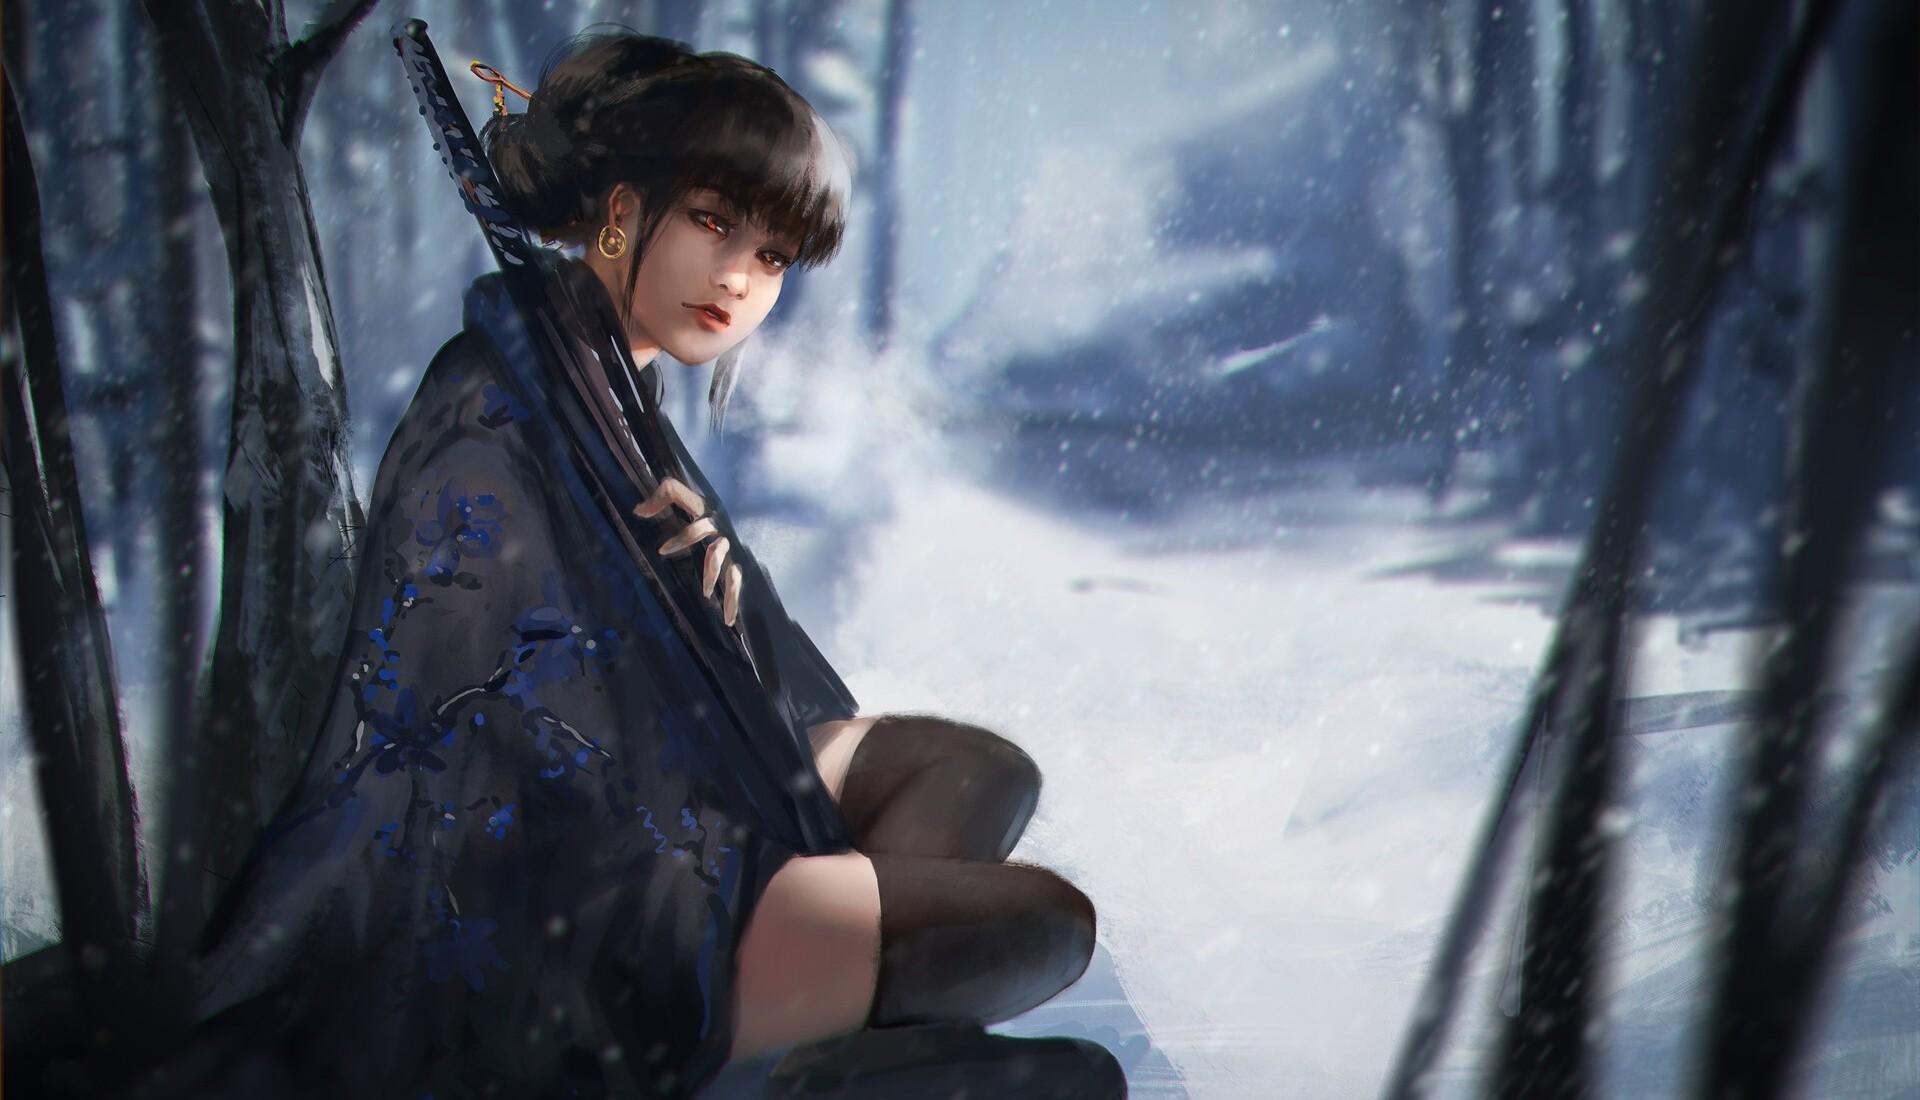 Girl Winter 1920x1100